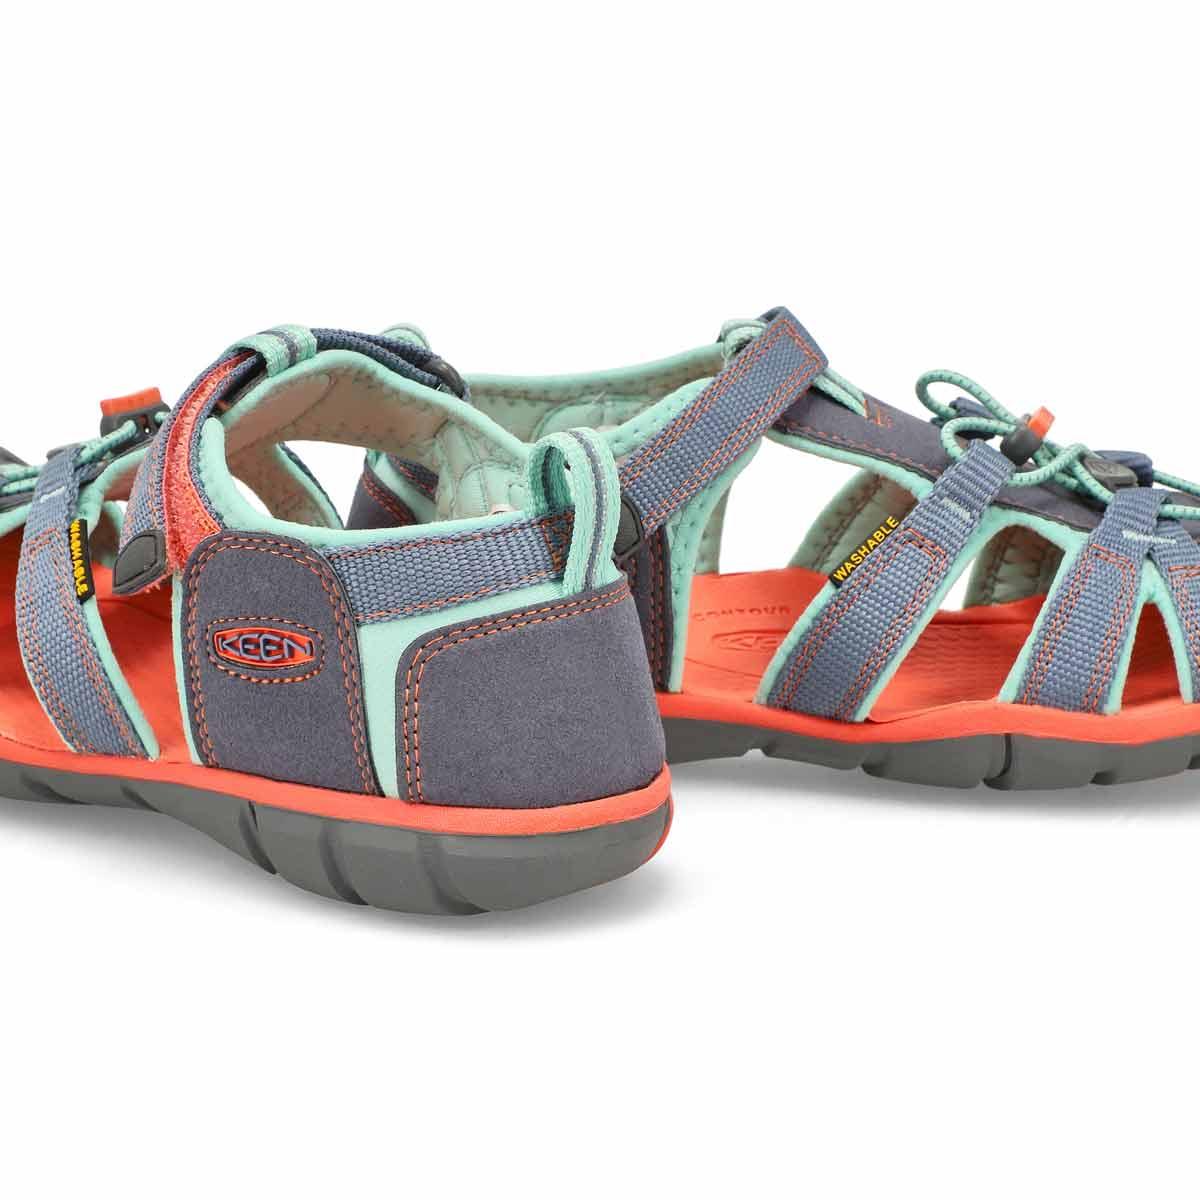 Girl's Seacamp II Sport Sandal - Stone/Ocean